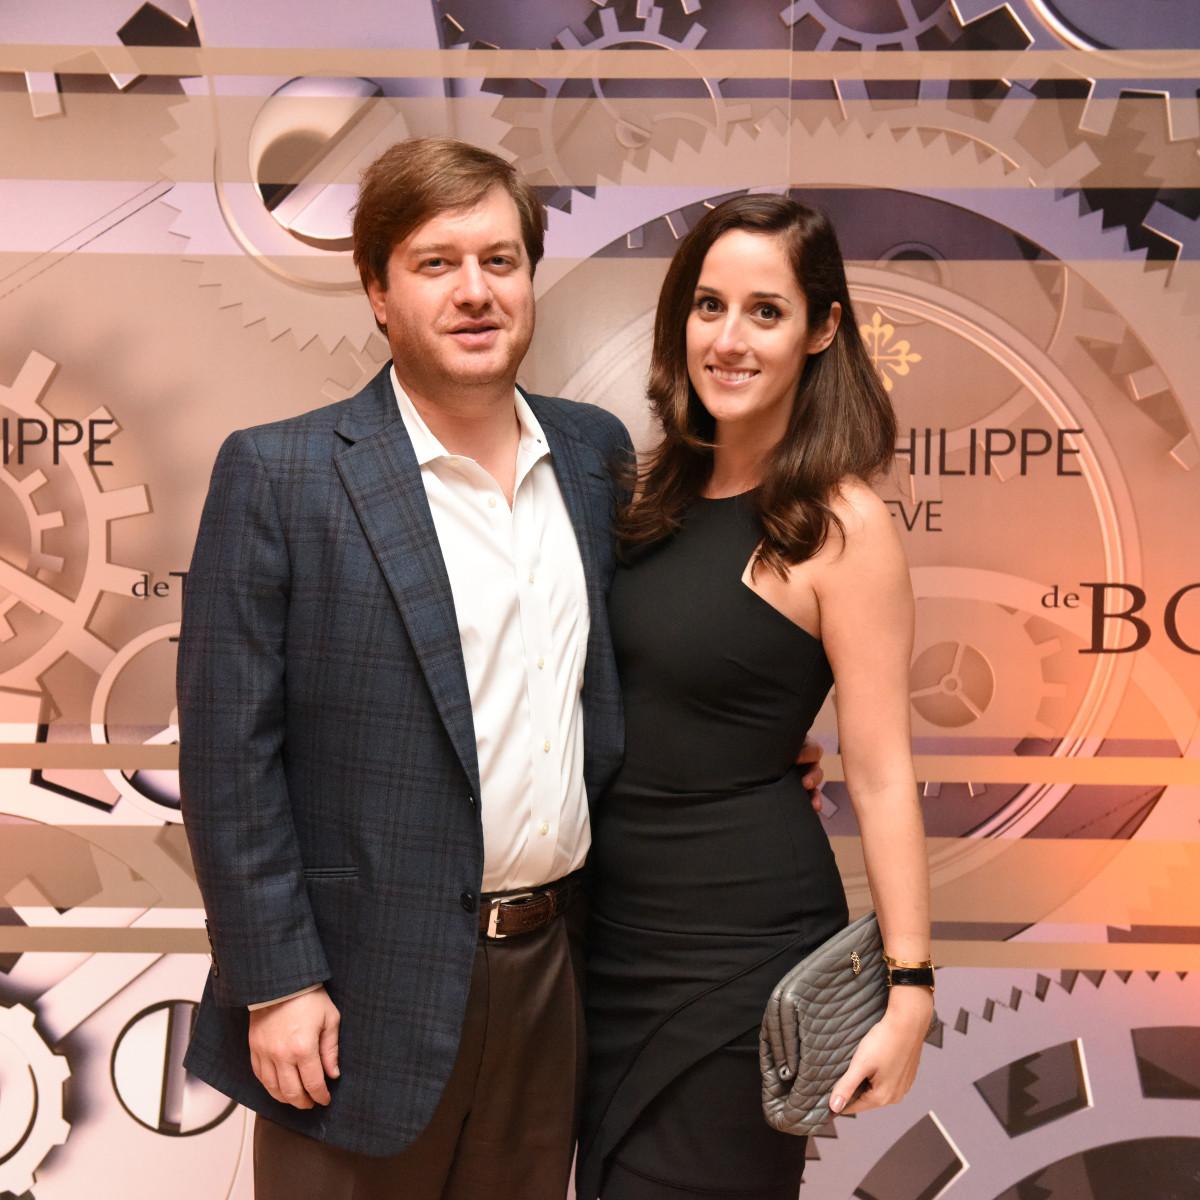 News, Shelby, de Boulle opening, Nov. 2015, Brian Kaplan